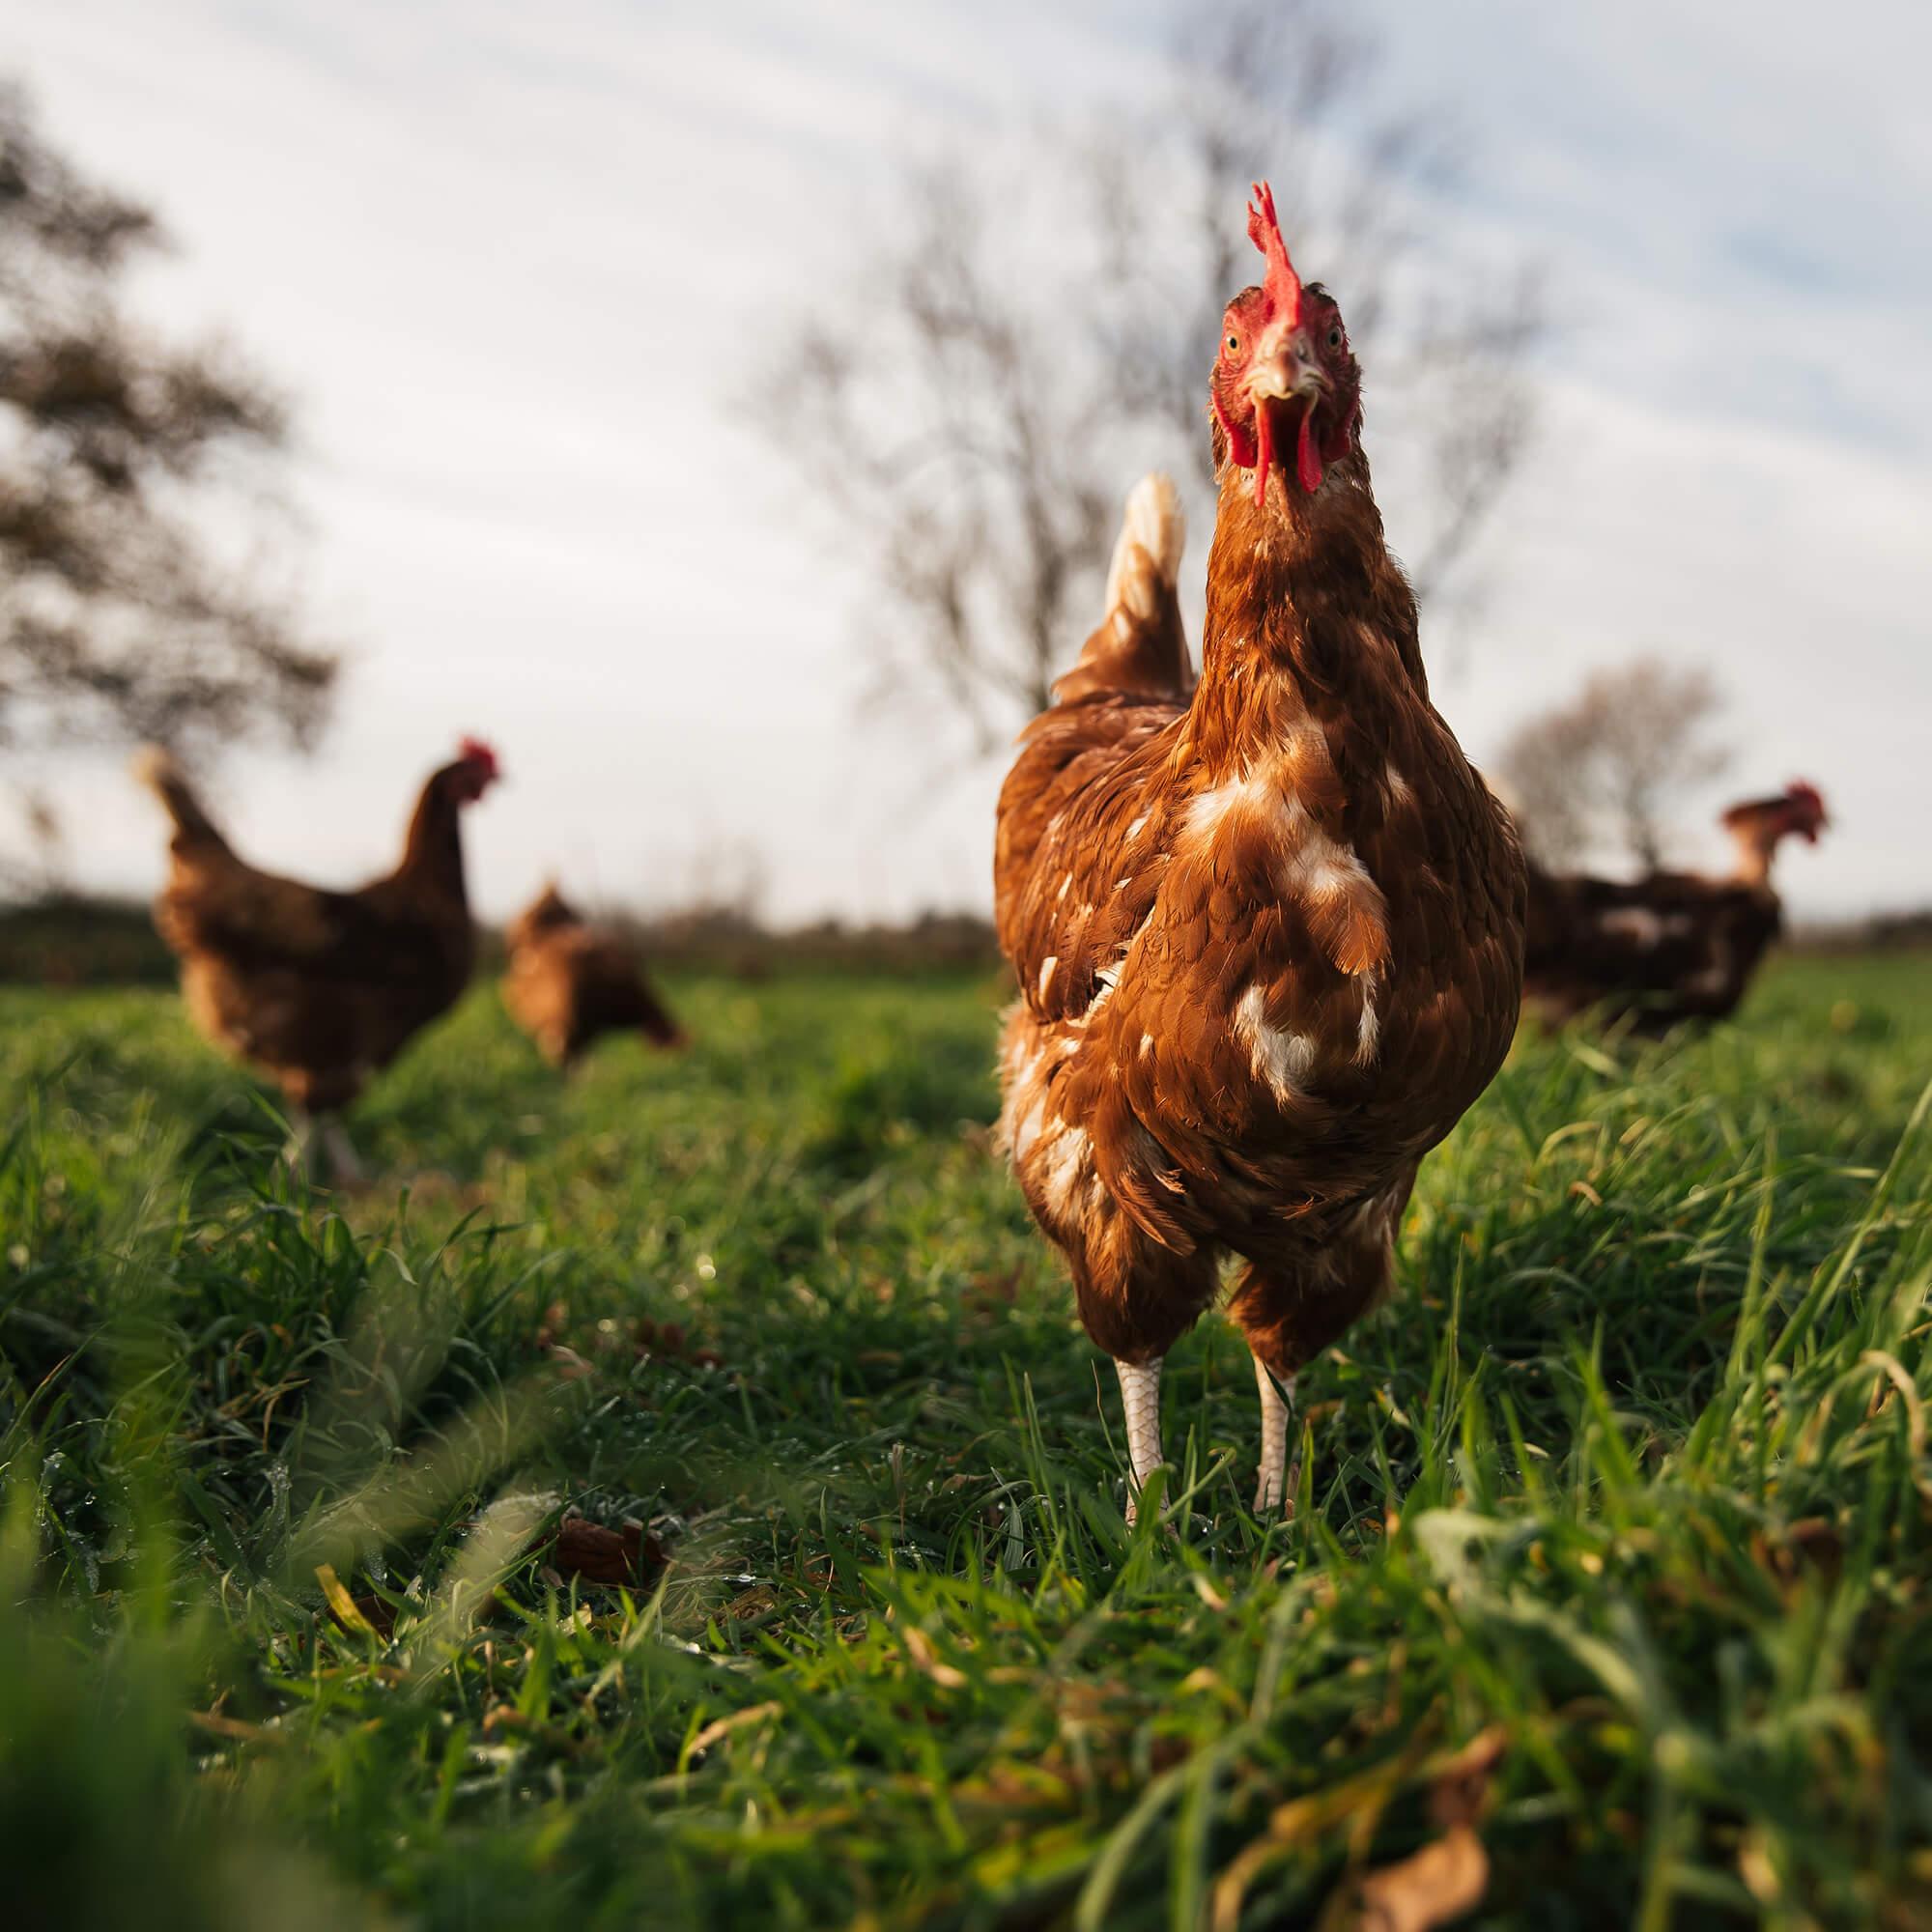 Eco Friendly Weddings - Free-Range Chickens and Eggs - Stokes Farm Wokingham - Love from Lila